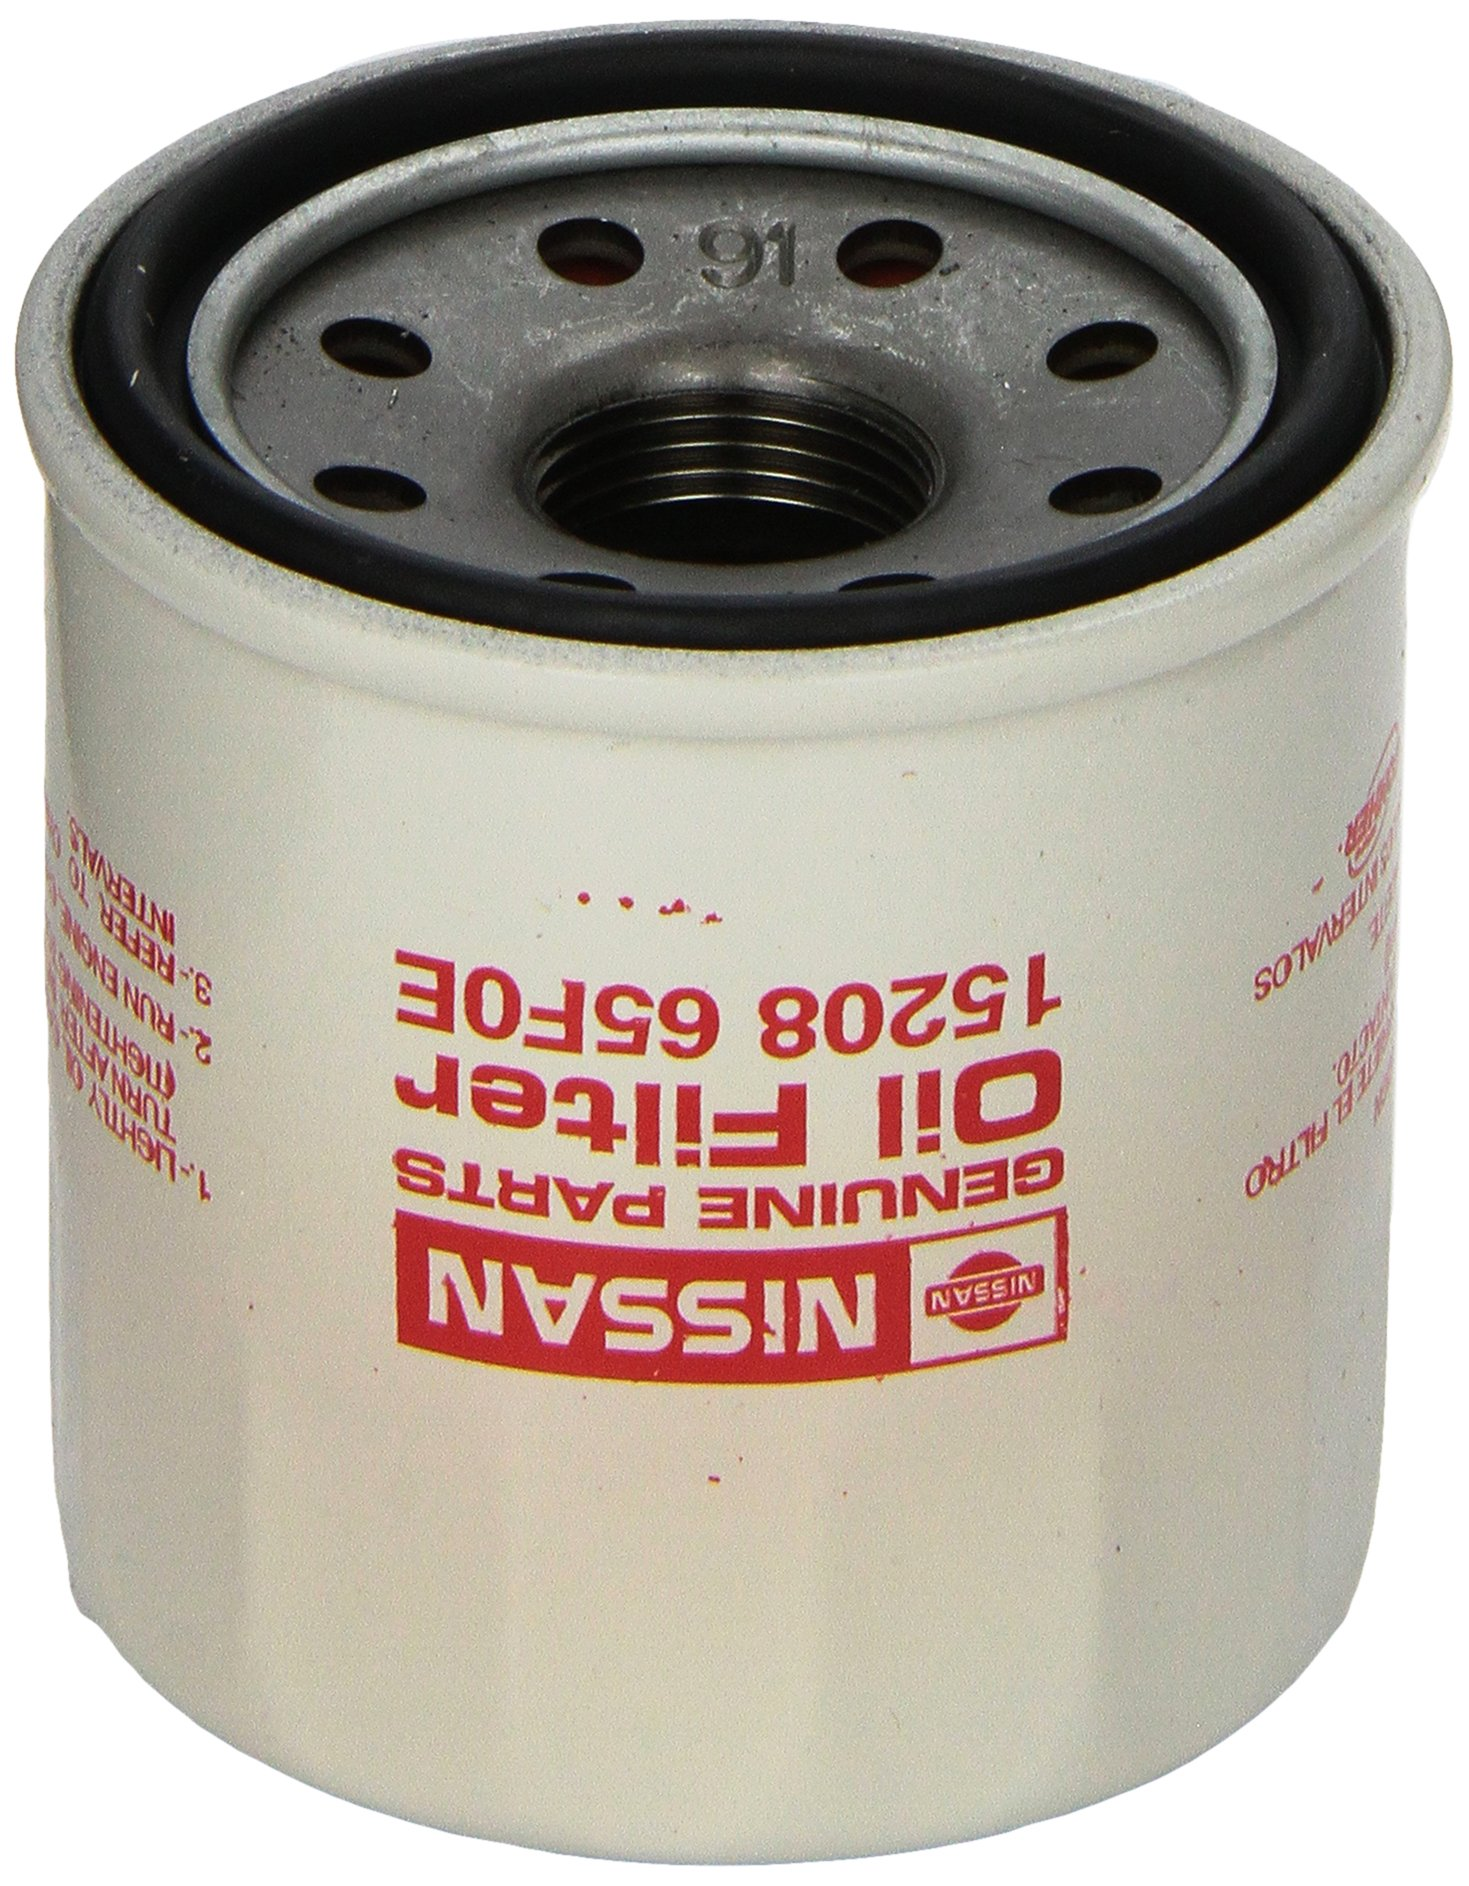 Nissan Sentra Service Manual: Oil filter